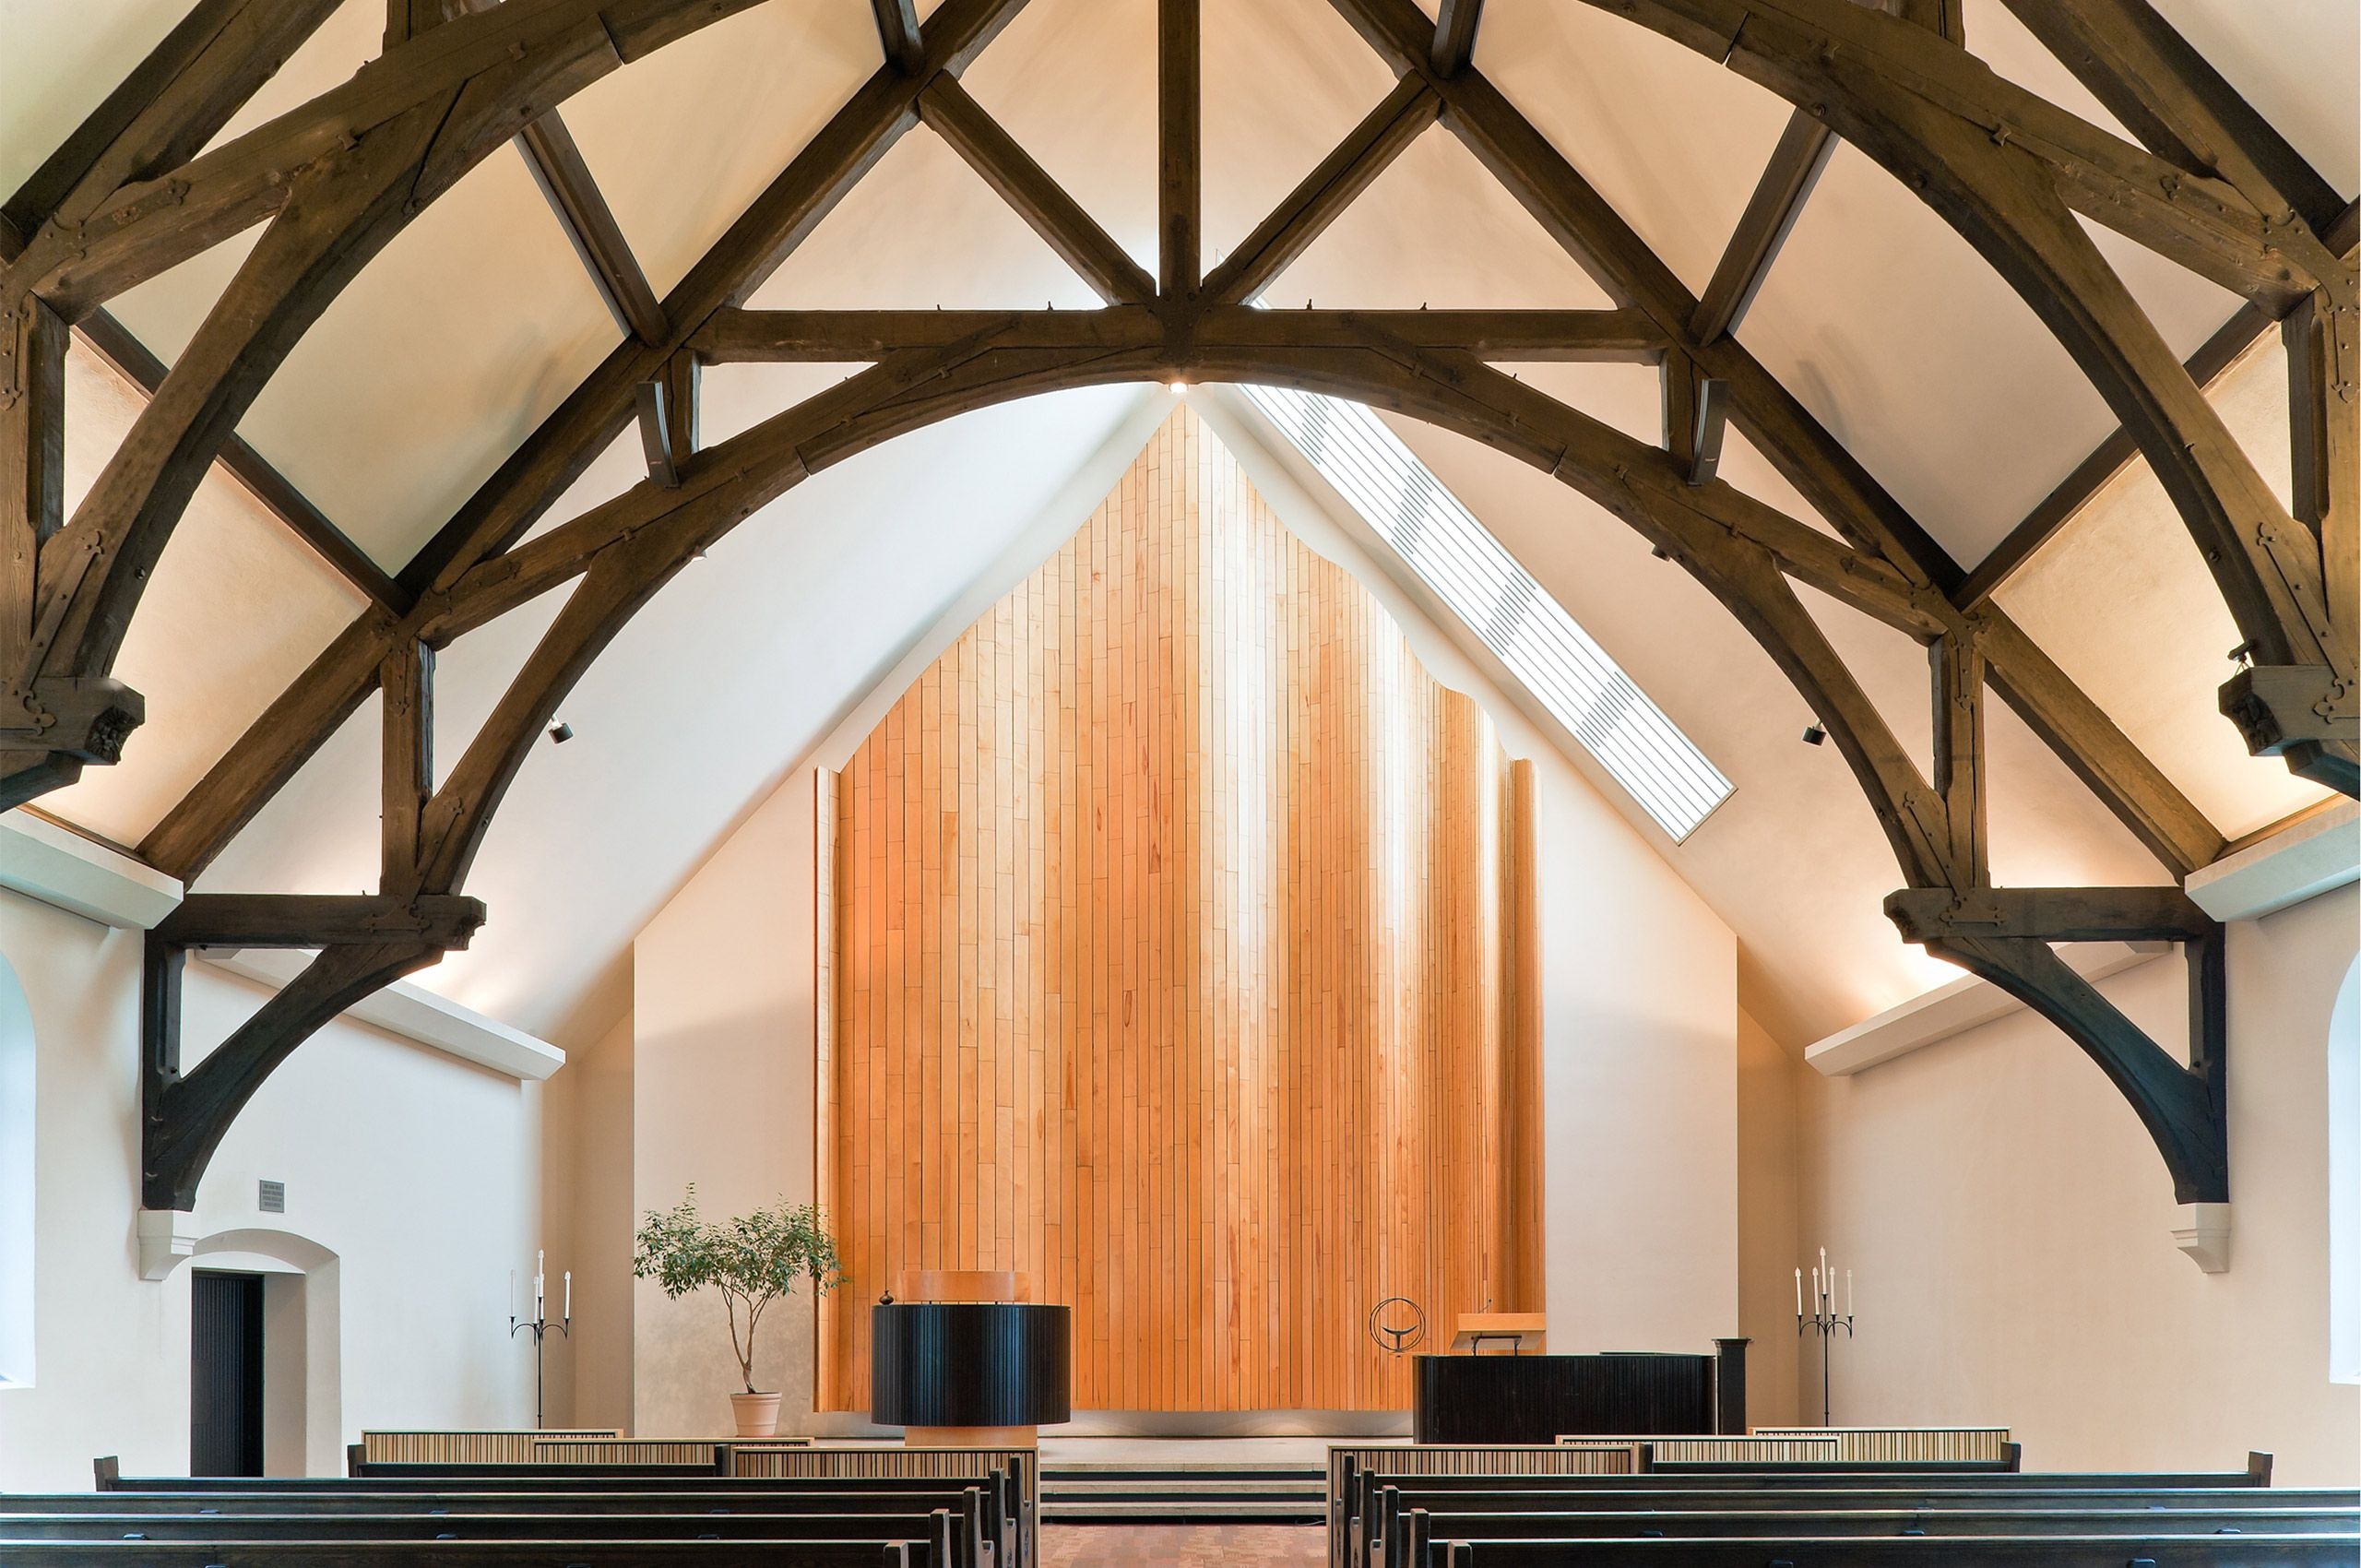 UNITY CHURCH UNITARIAN